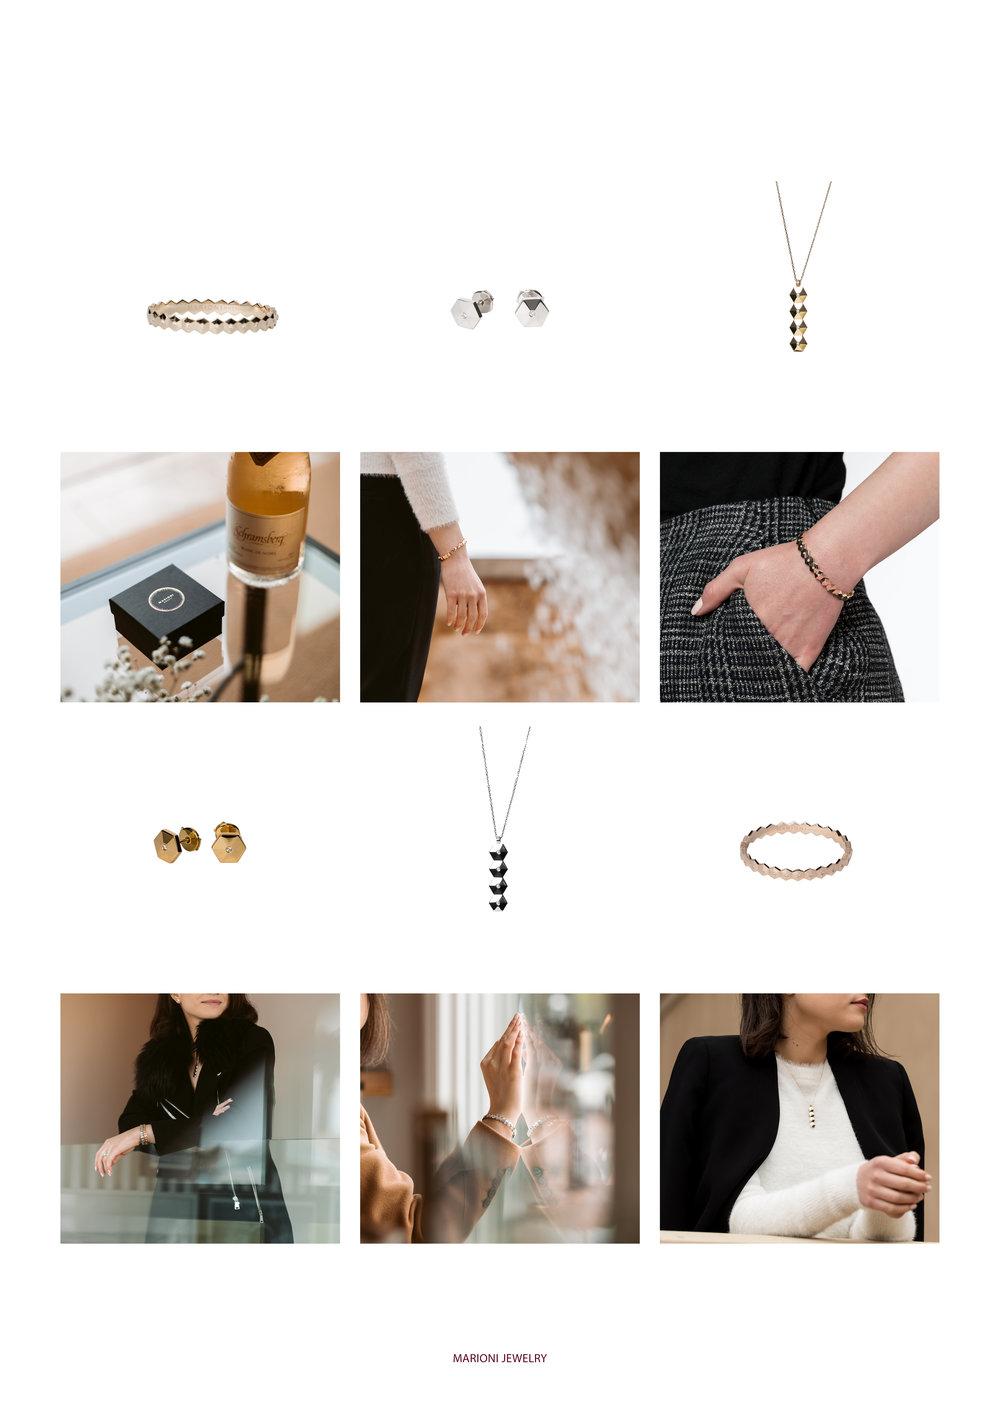 Marioni_Jewelry_IG3.jpg